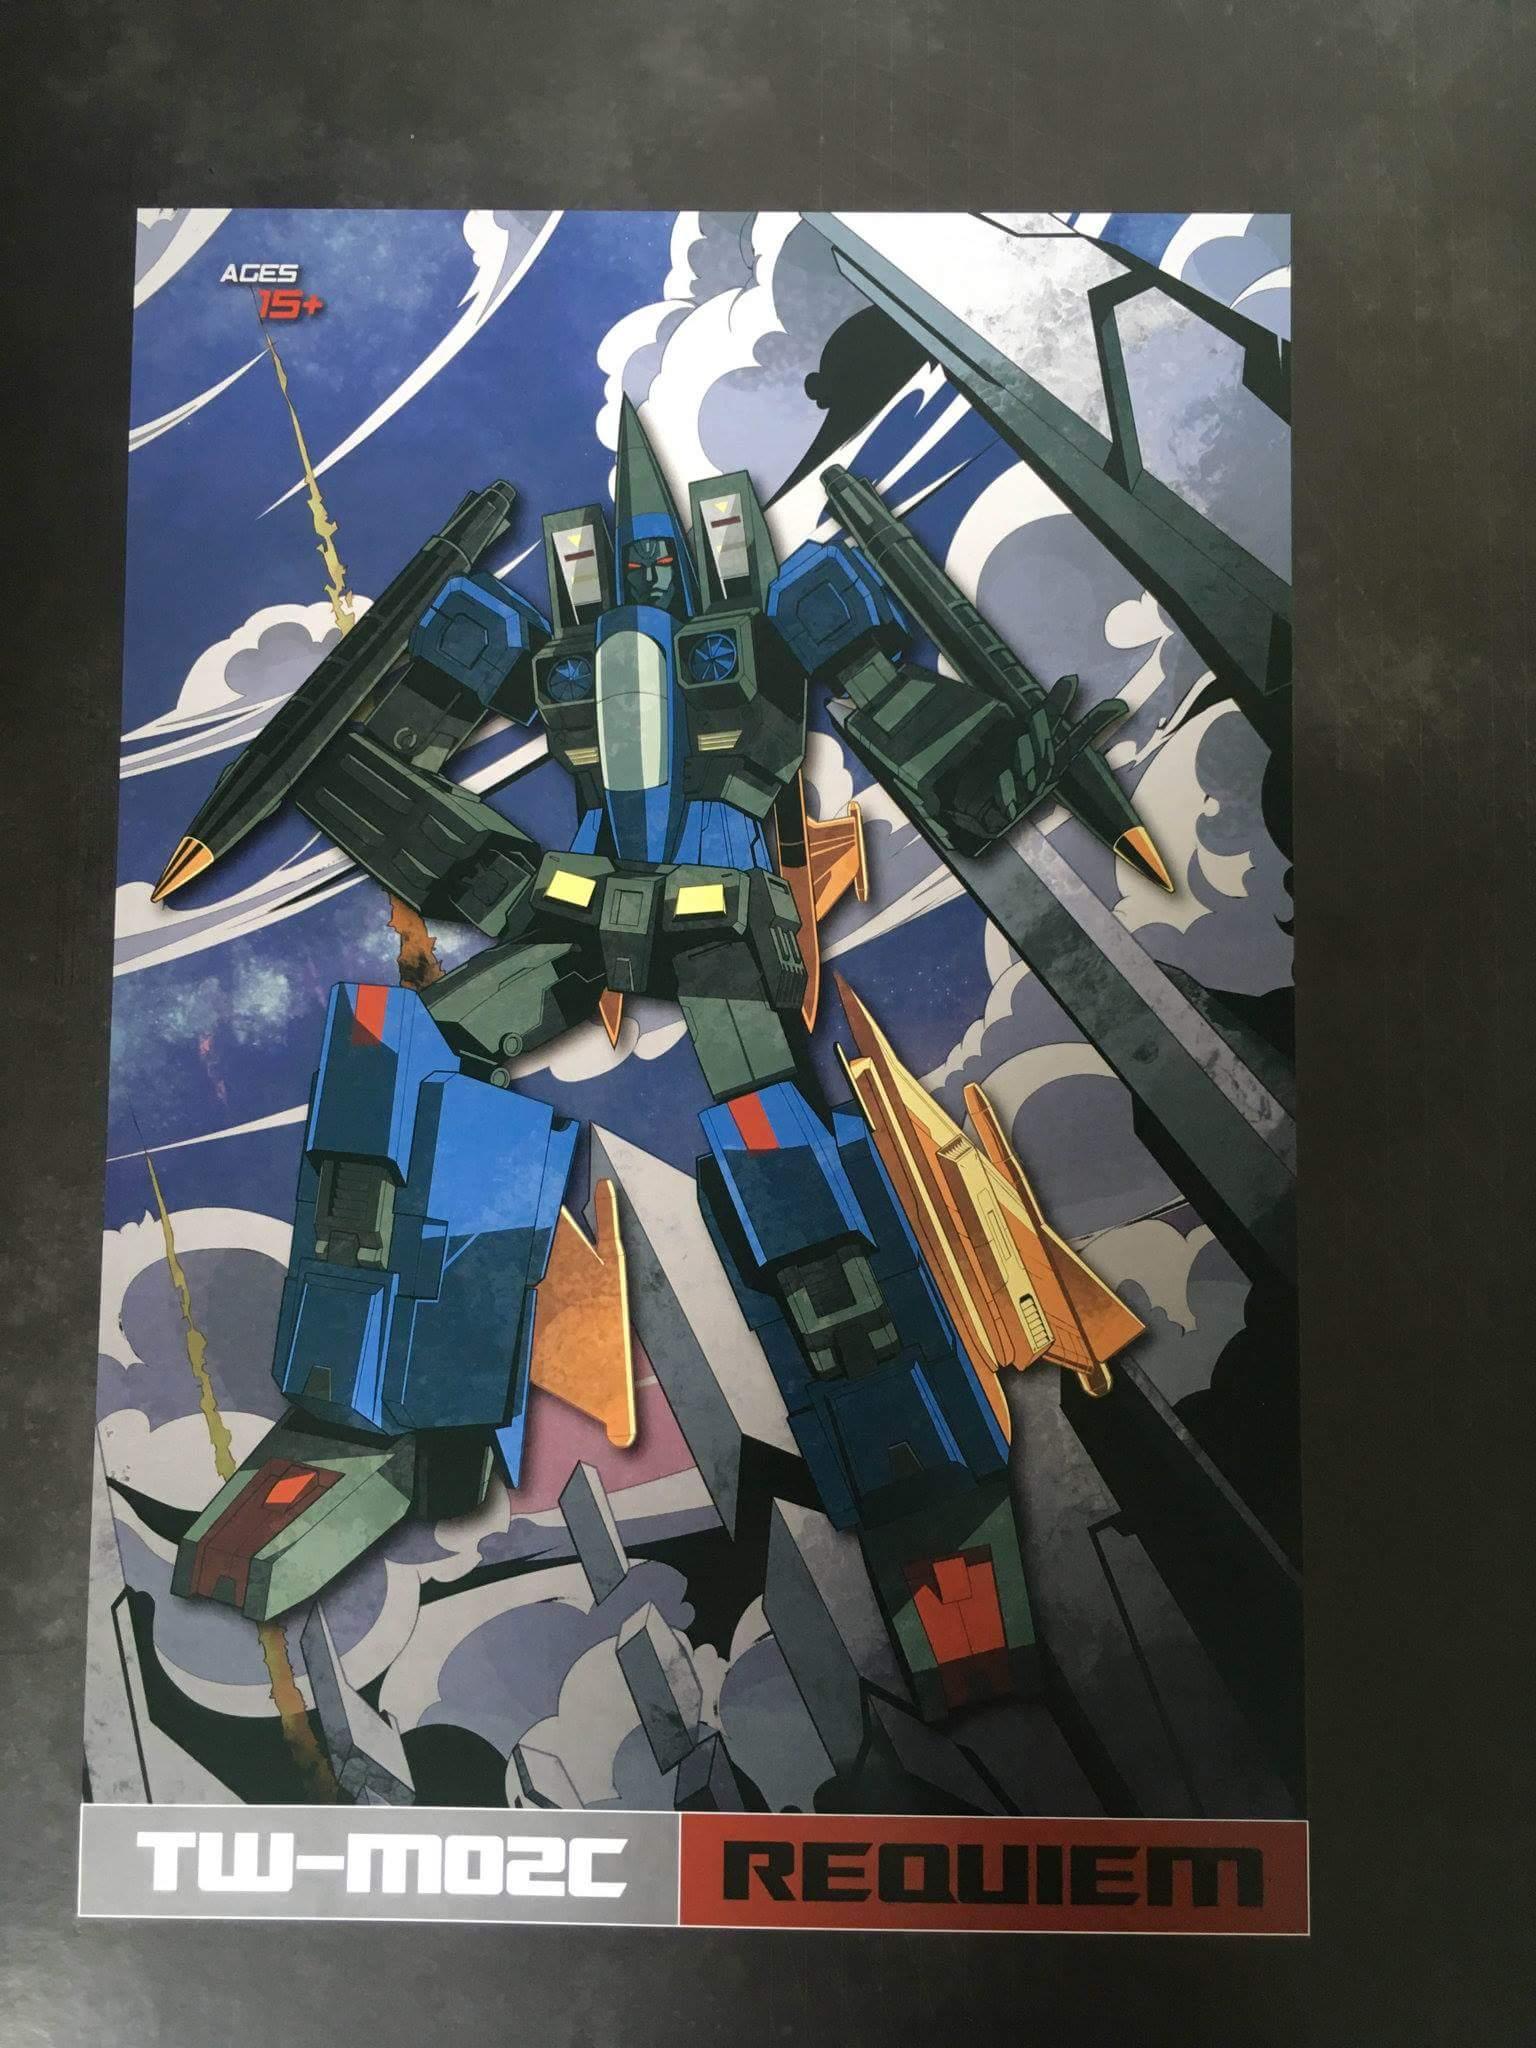 [ToyWorld] Produit Tiers - TW-M02A Combustor (Ramjet/Statoréacto), TW-M02B Assault (Thrust/Fatalo), TW-M02C Requiem (Dirge/Funébro) - Page 2 35NRSXBQ